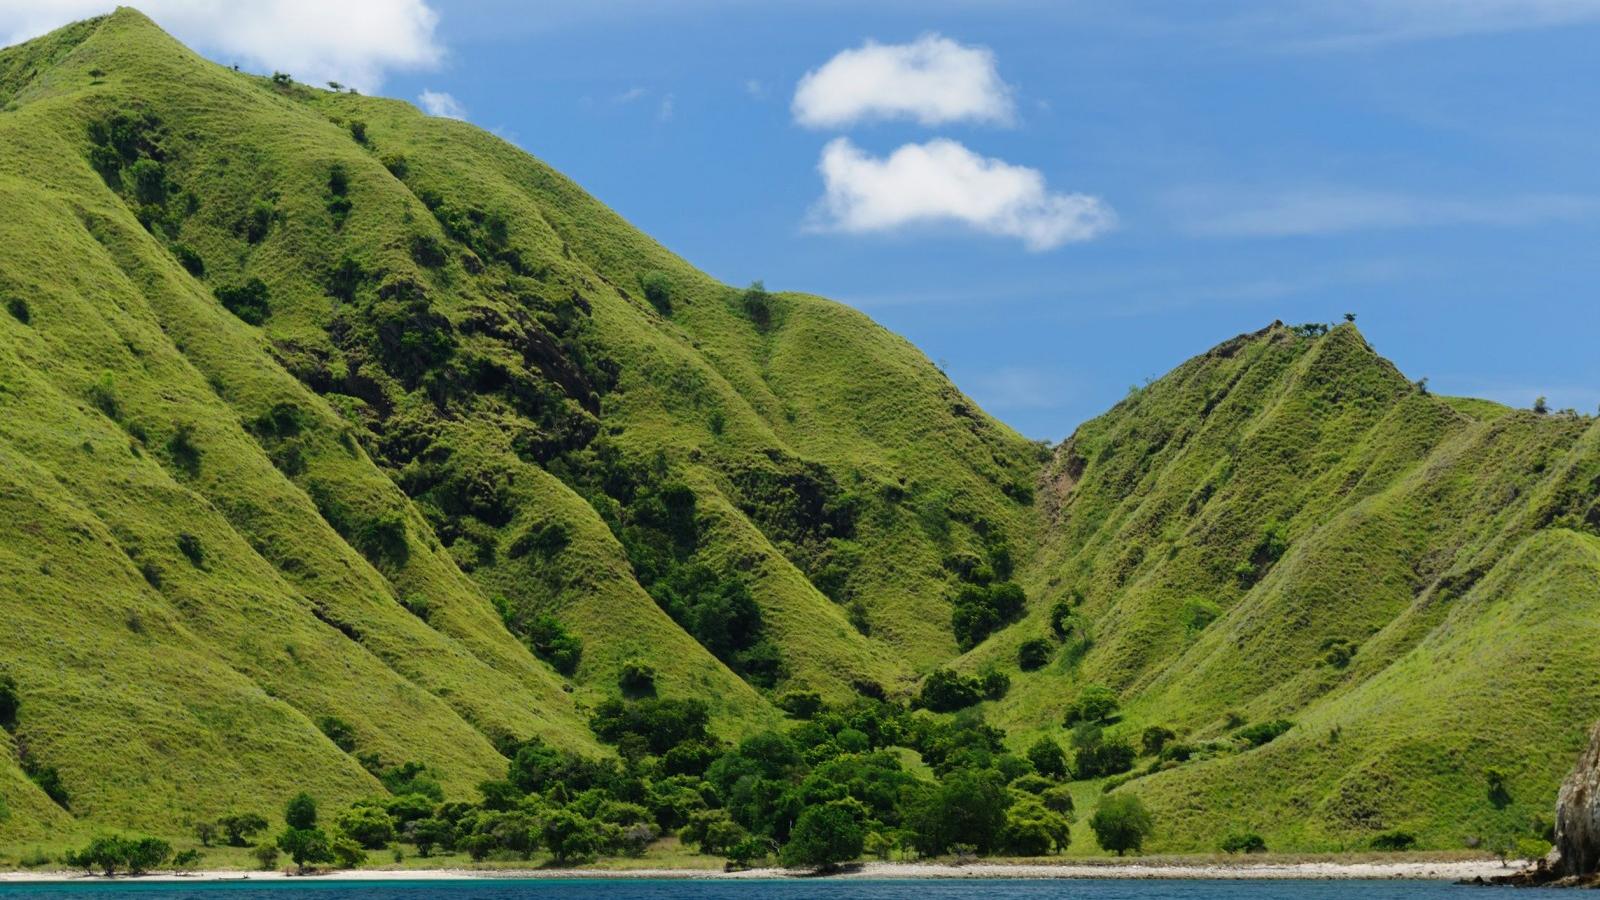 komodo-island-landscape.jpg